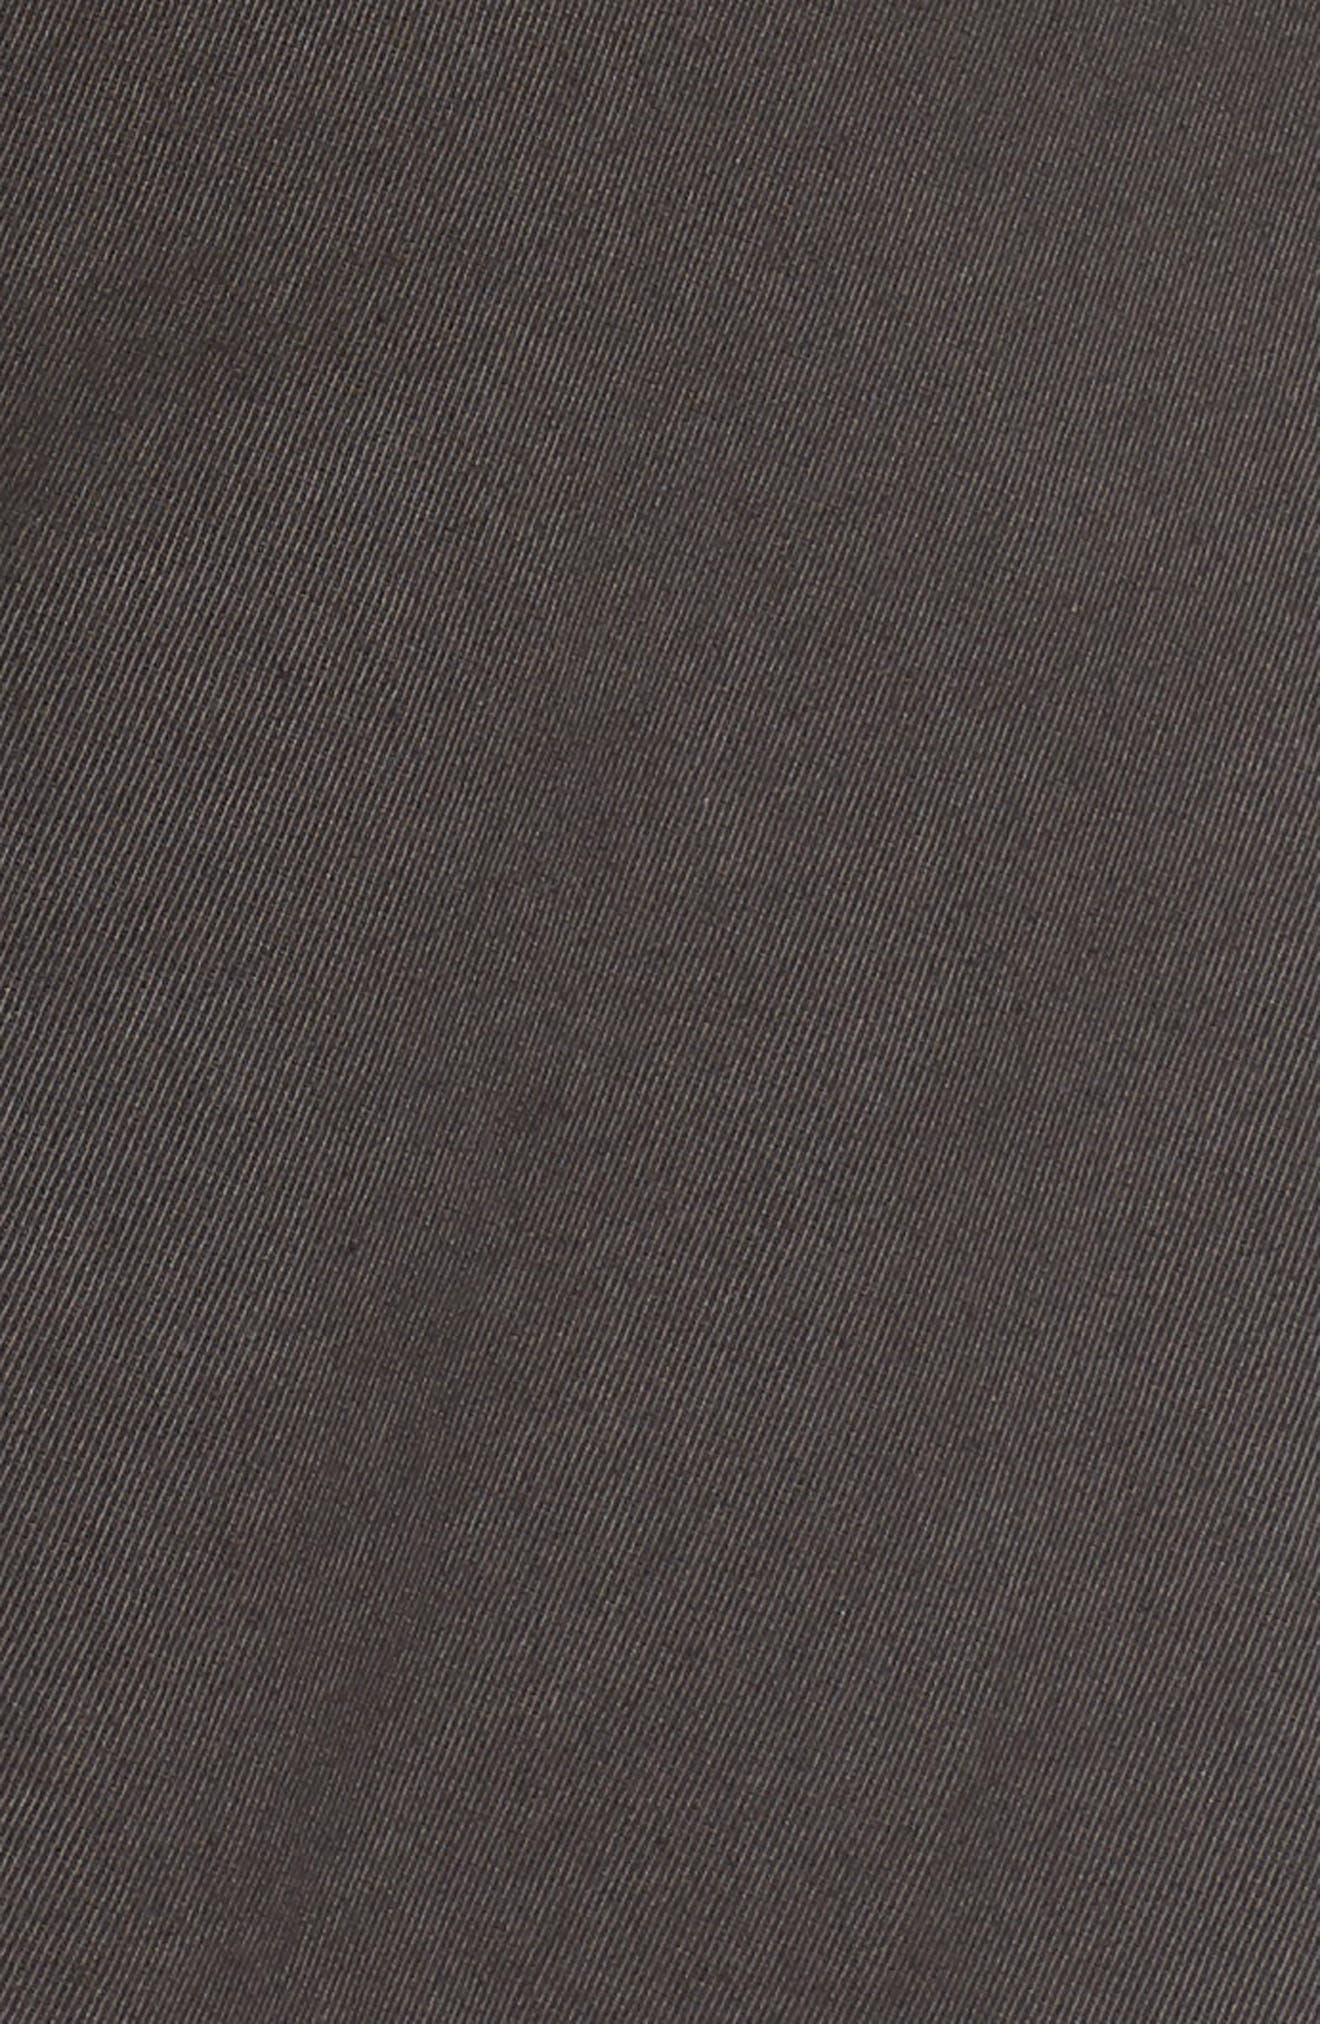 Marshall Slim Straight Leg Chino Pants,                             Alternate thumbnail 5, color,                             039